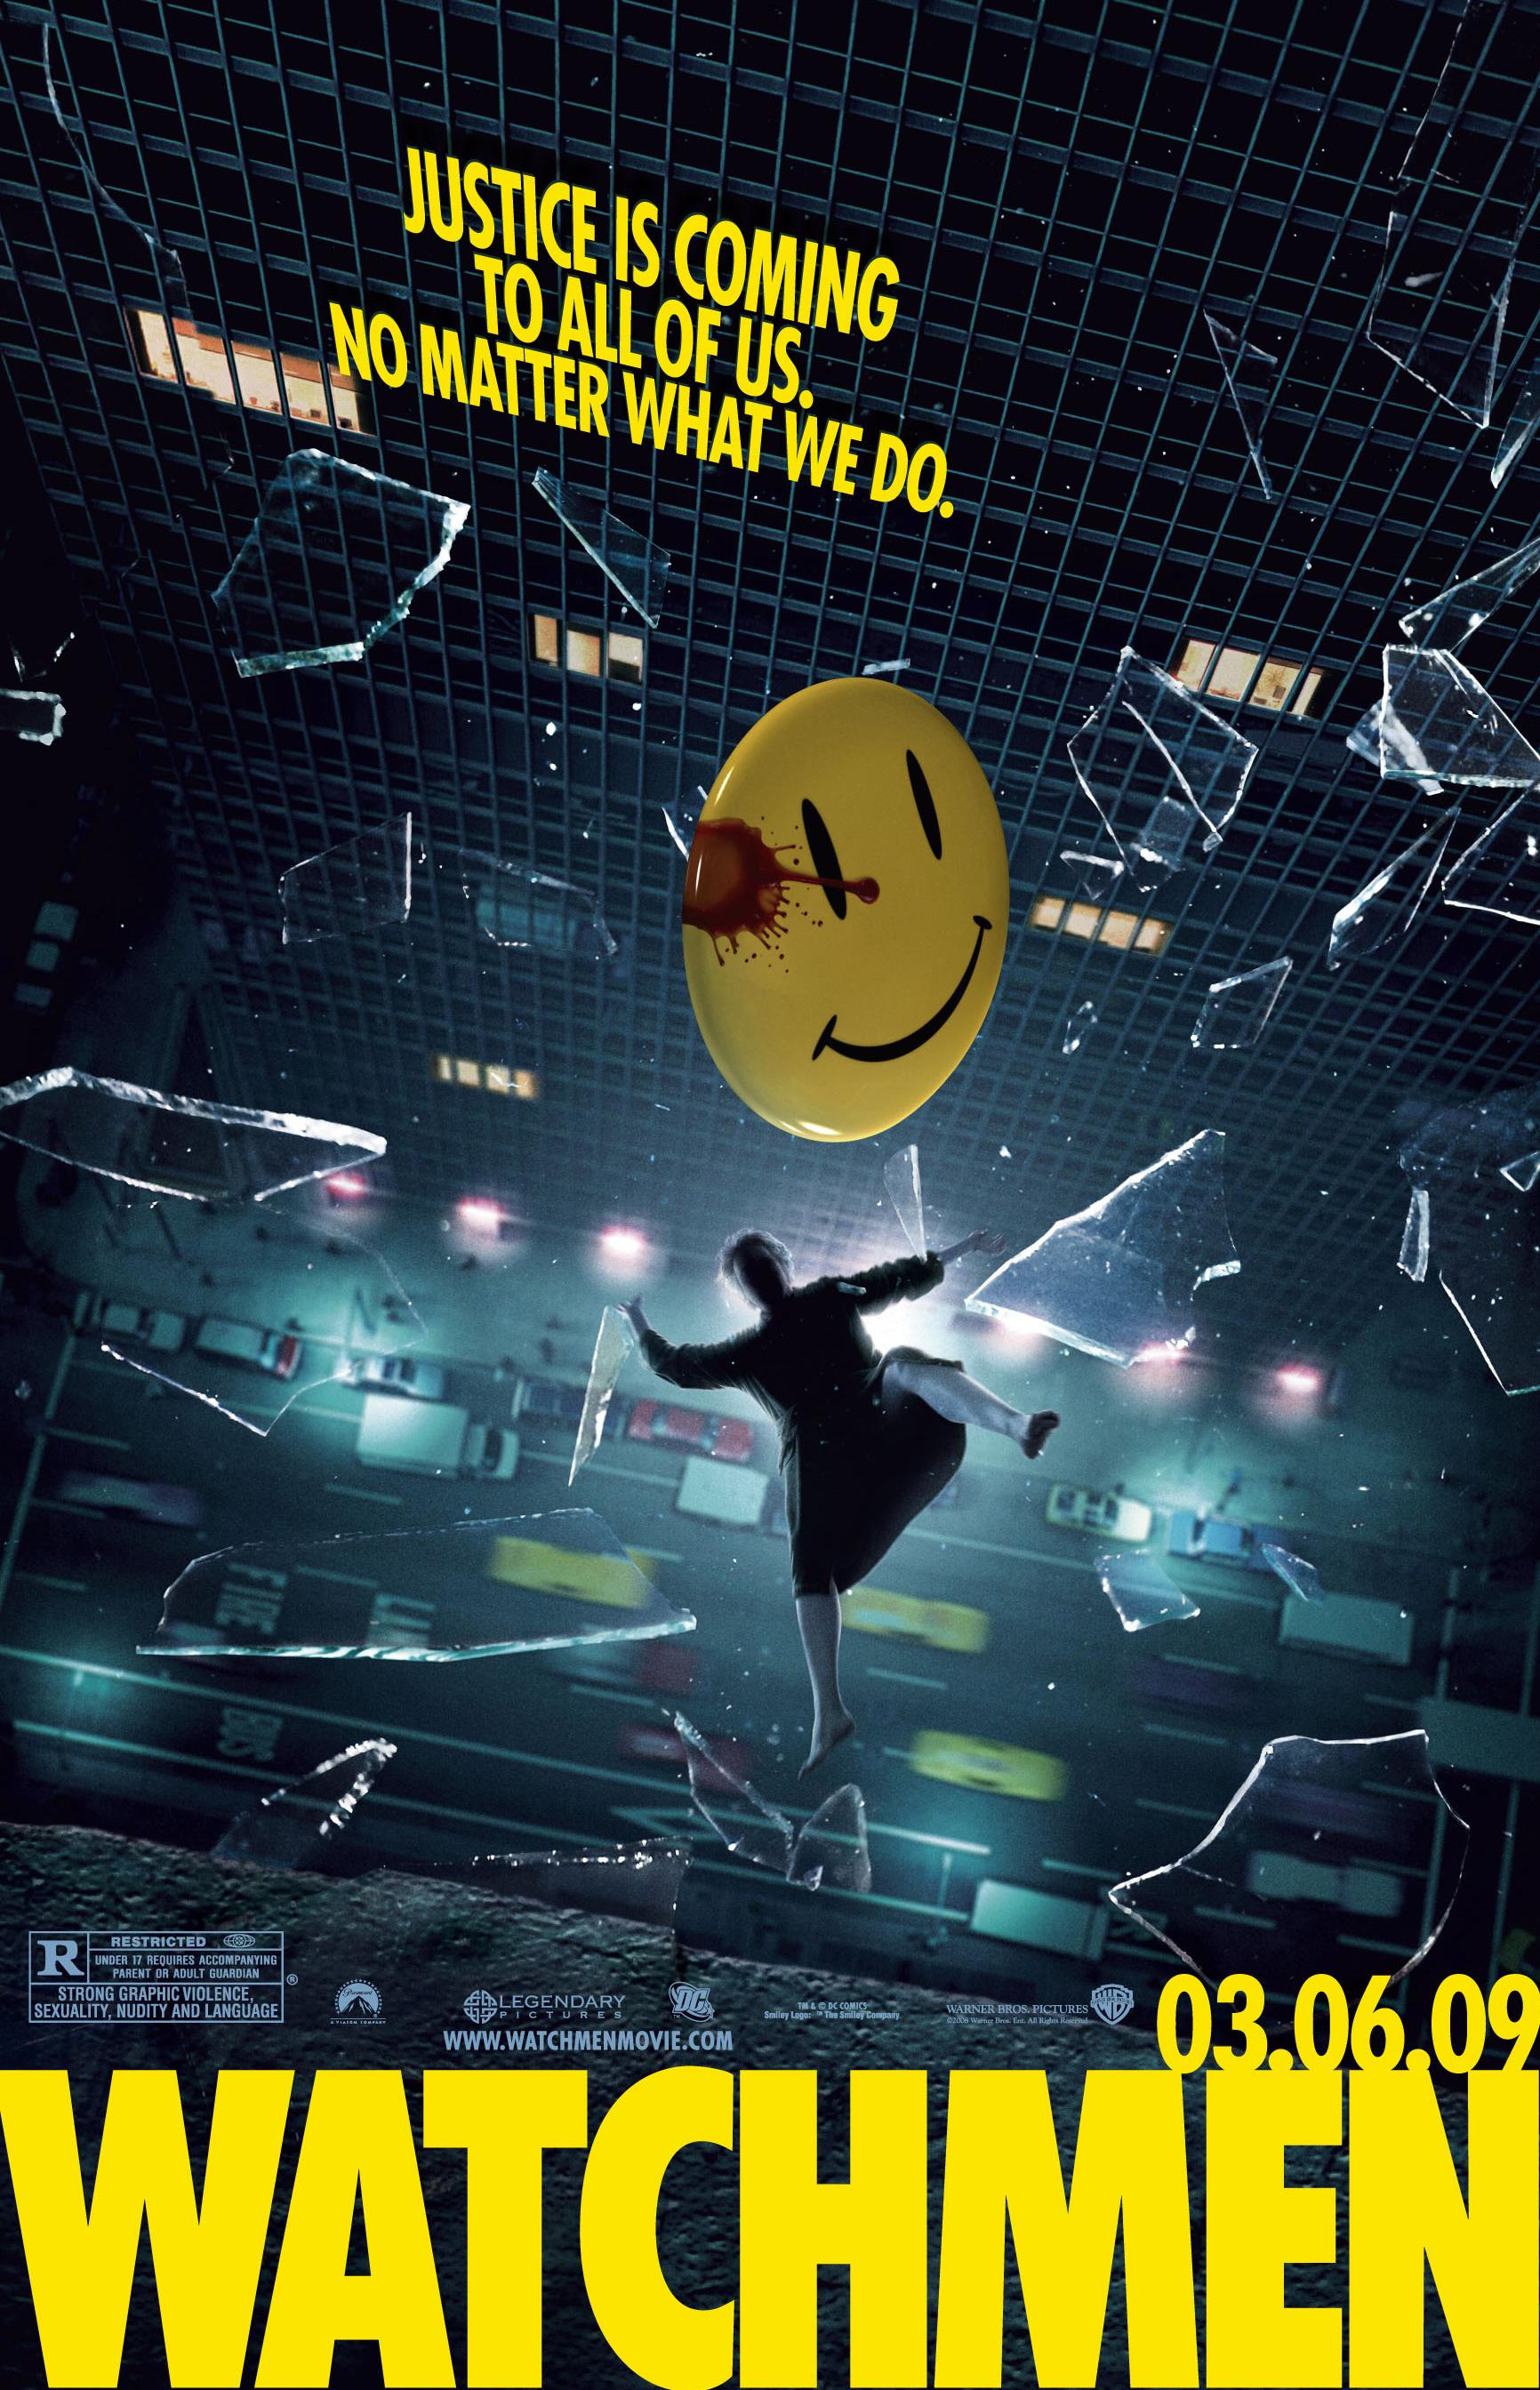 Watchmen 2009 Film Watchmen Wiki Fandom